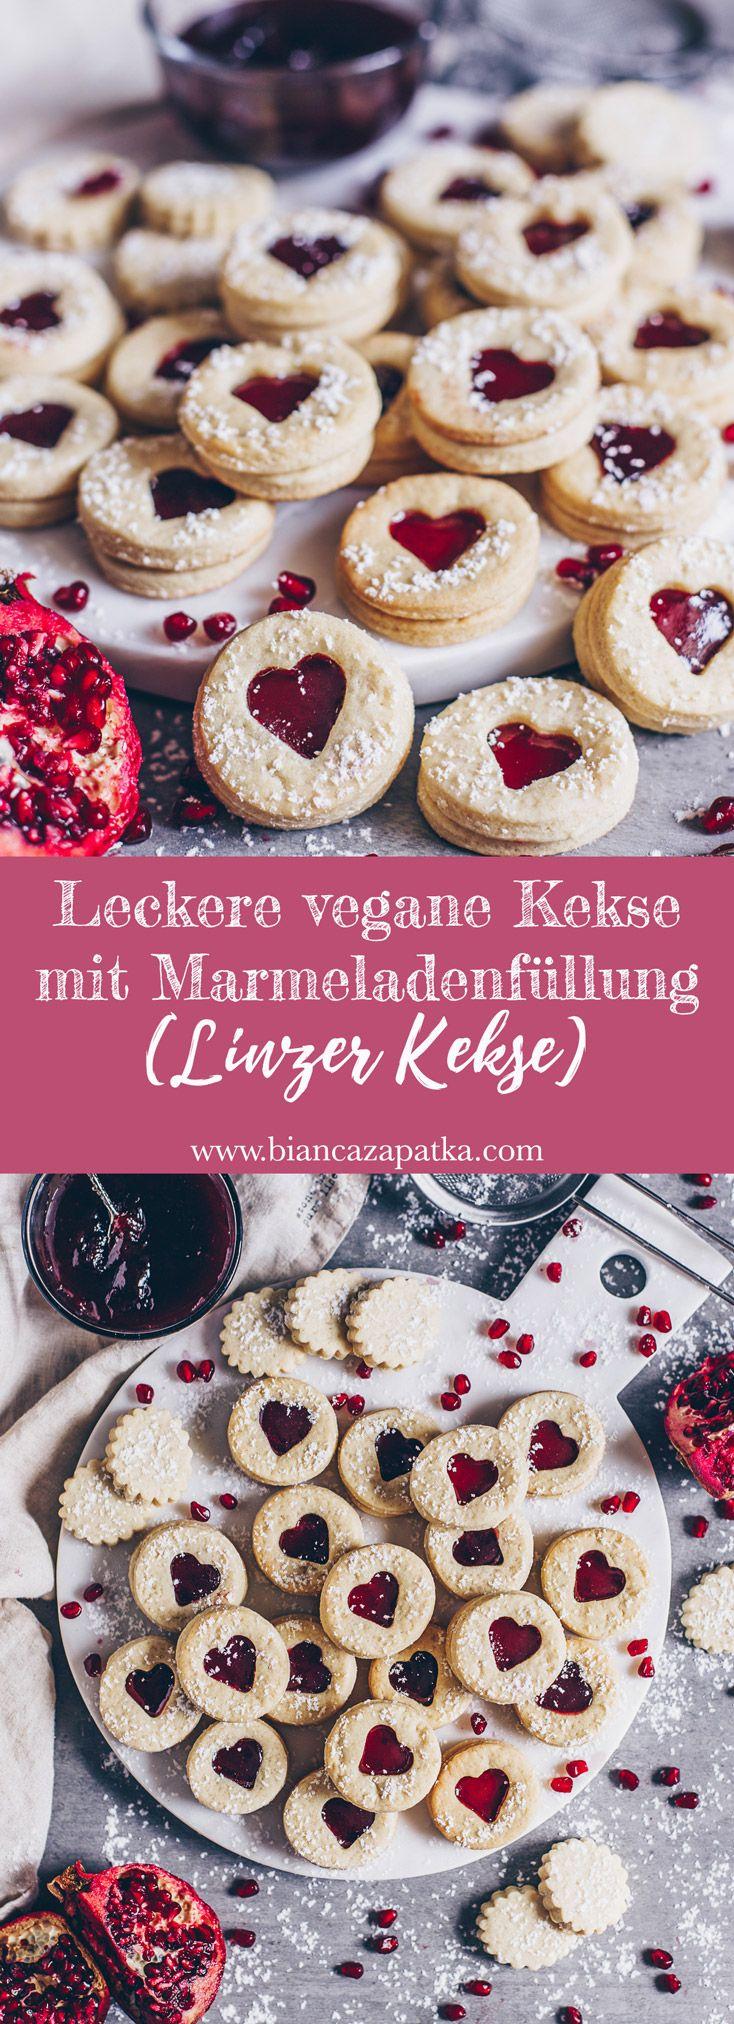 Leckere vegane Kekse mit Marmeladenfüllung (Spitzbuben Plätzchen) - Bianca Zapatka | Rezepte #kuchenkekse